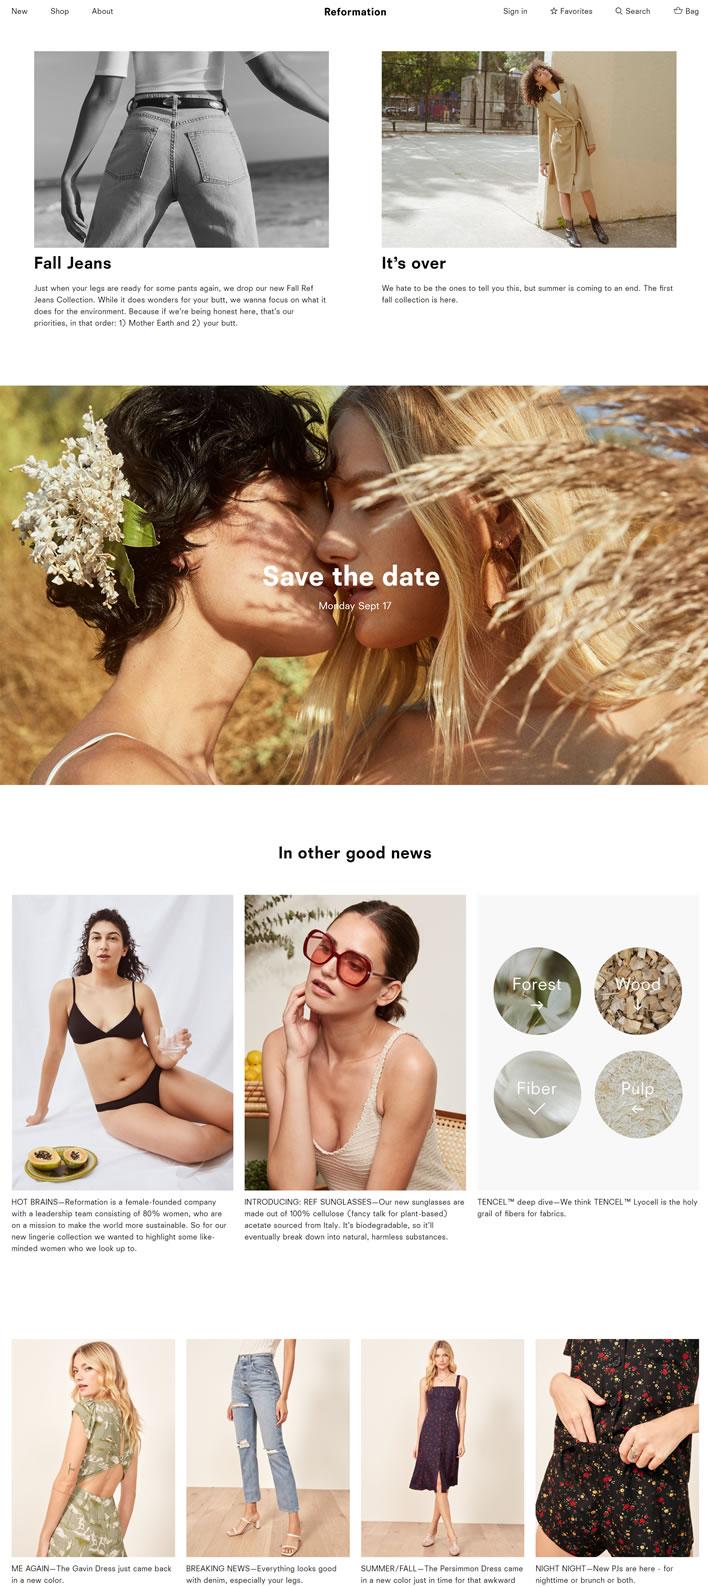 Reformation官网:美国女装品牌